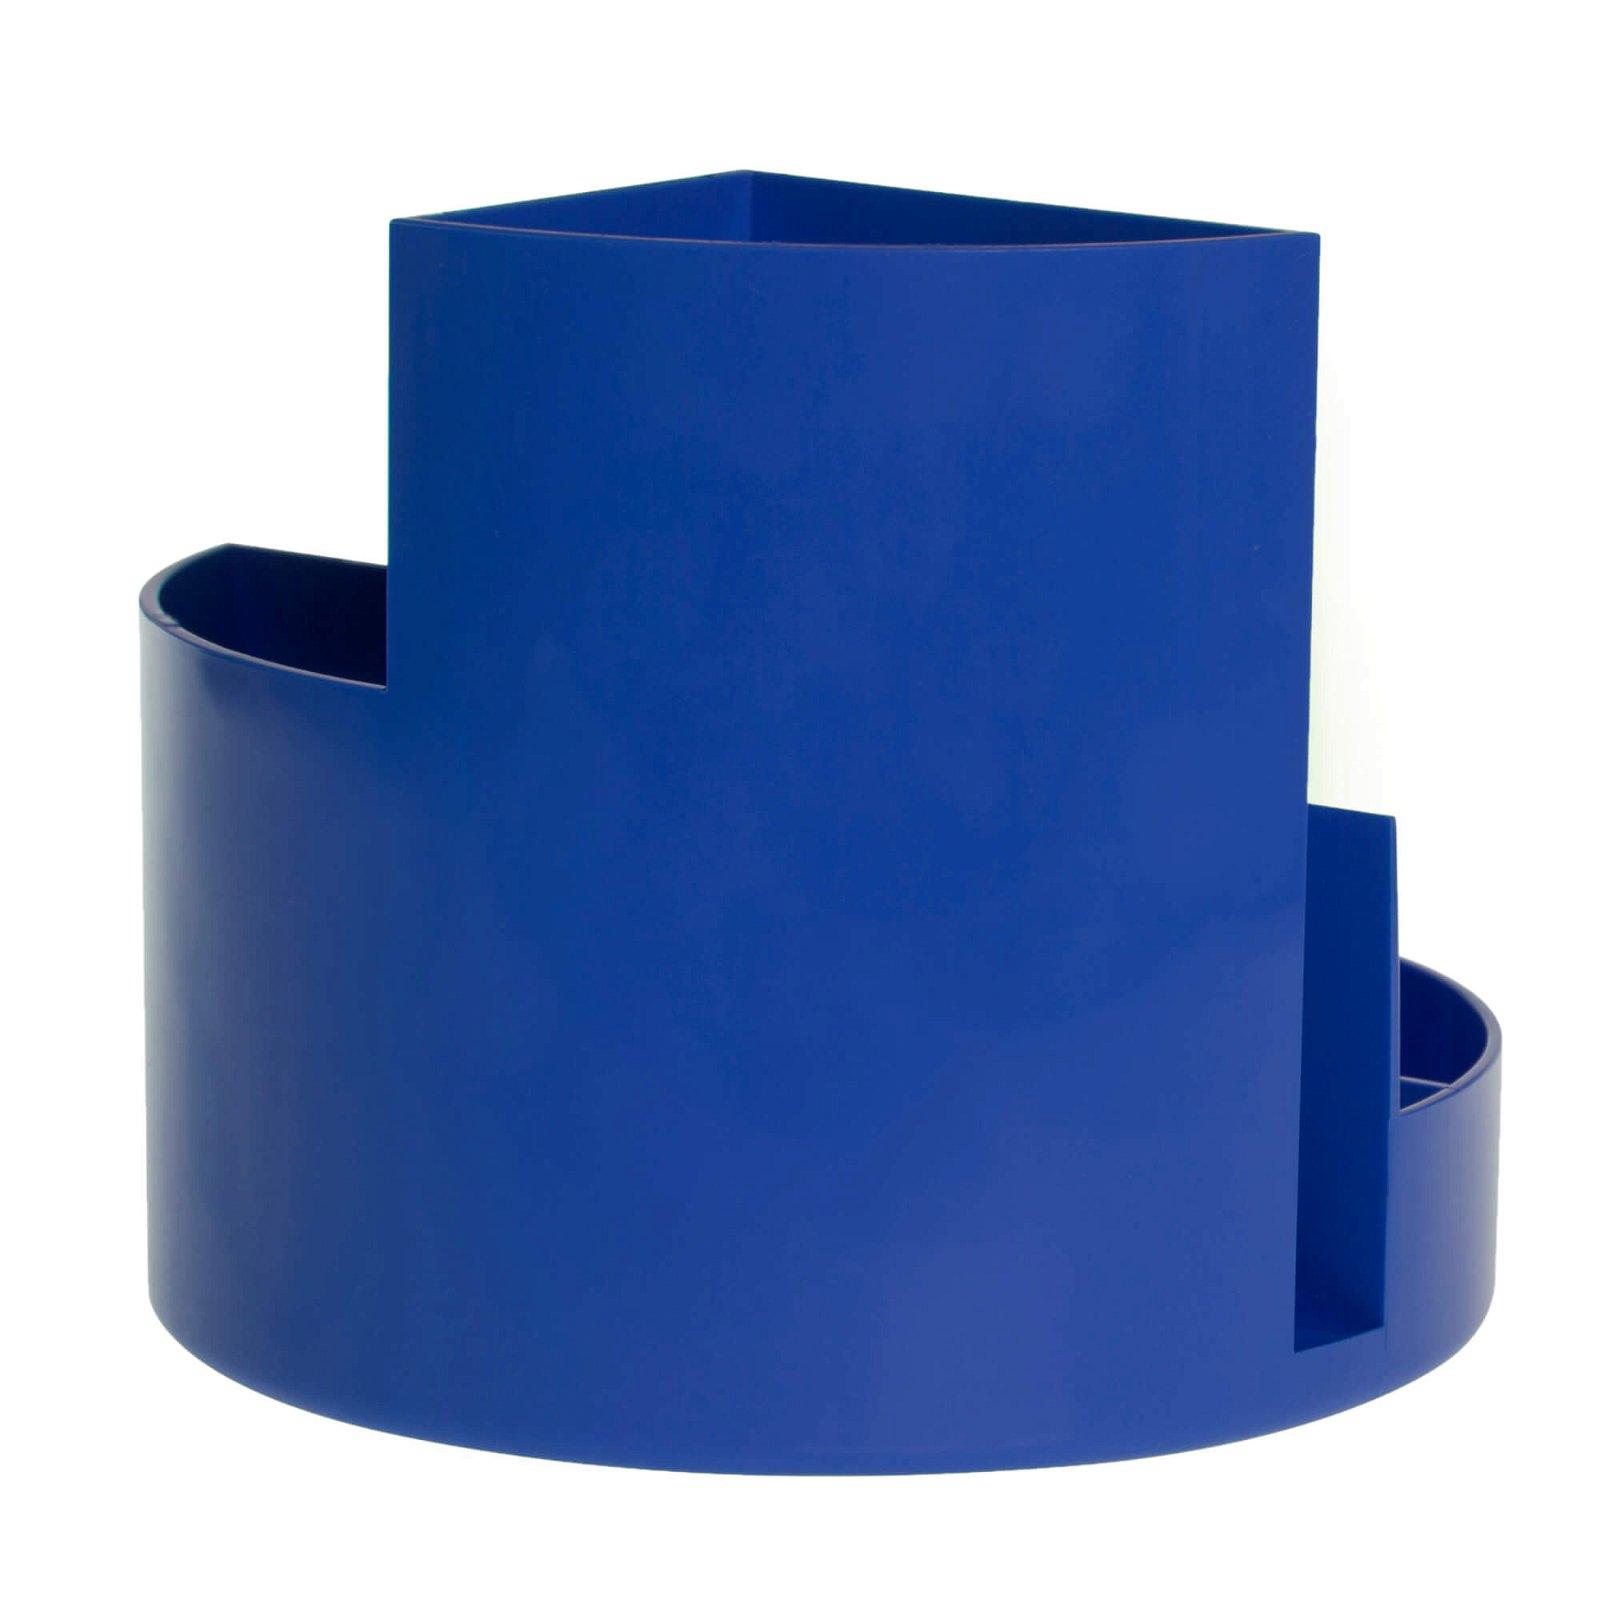 Rundbox, blau